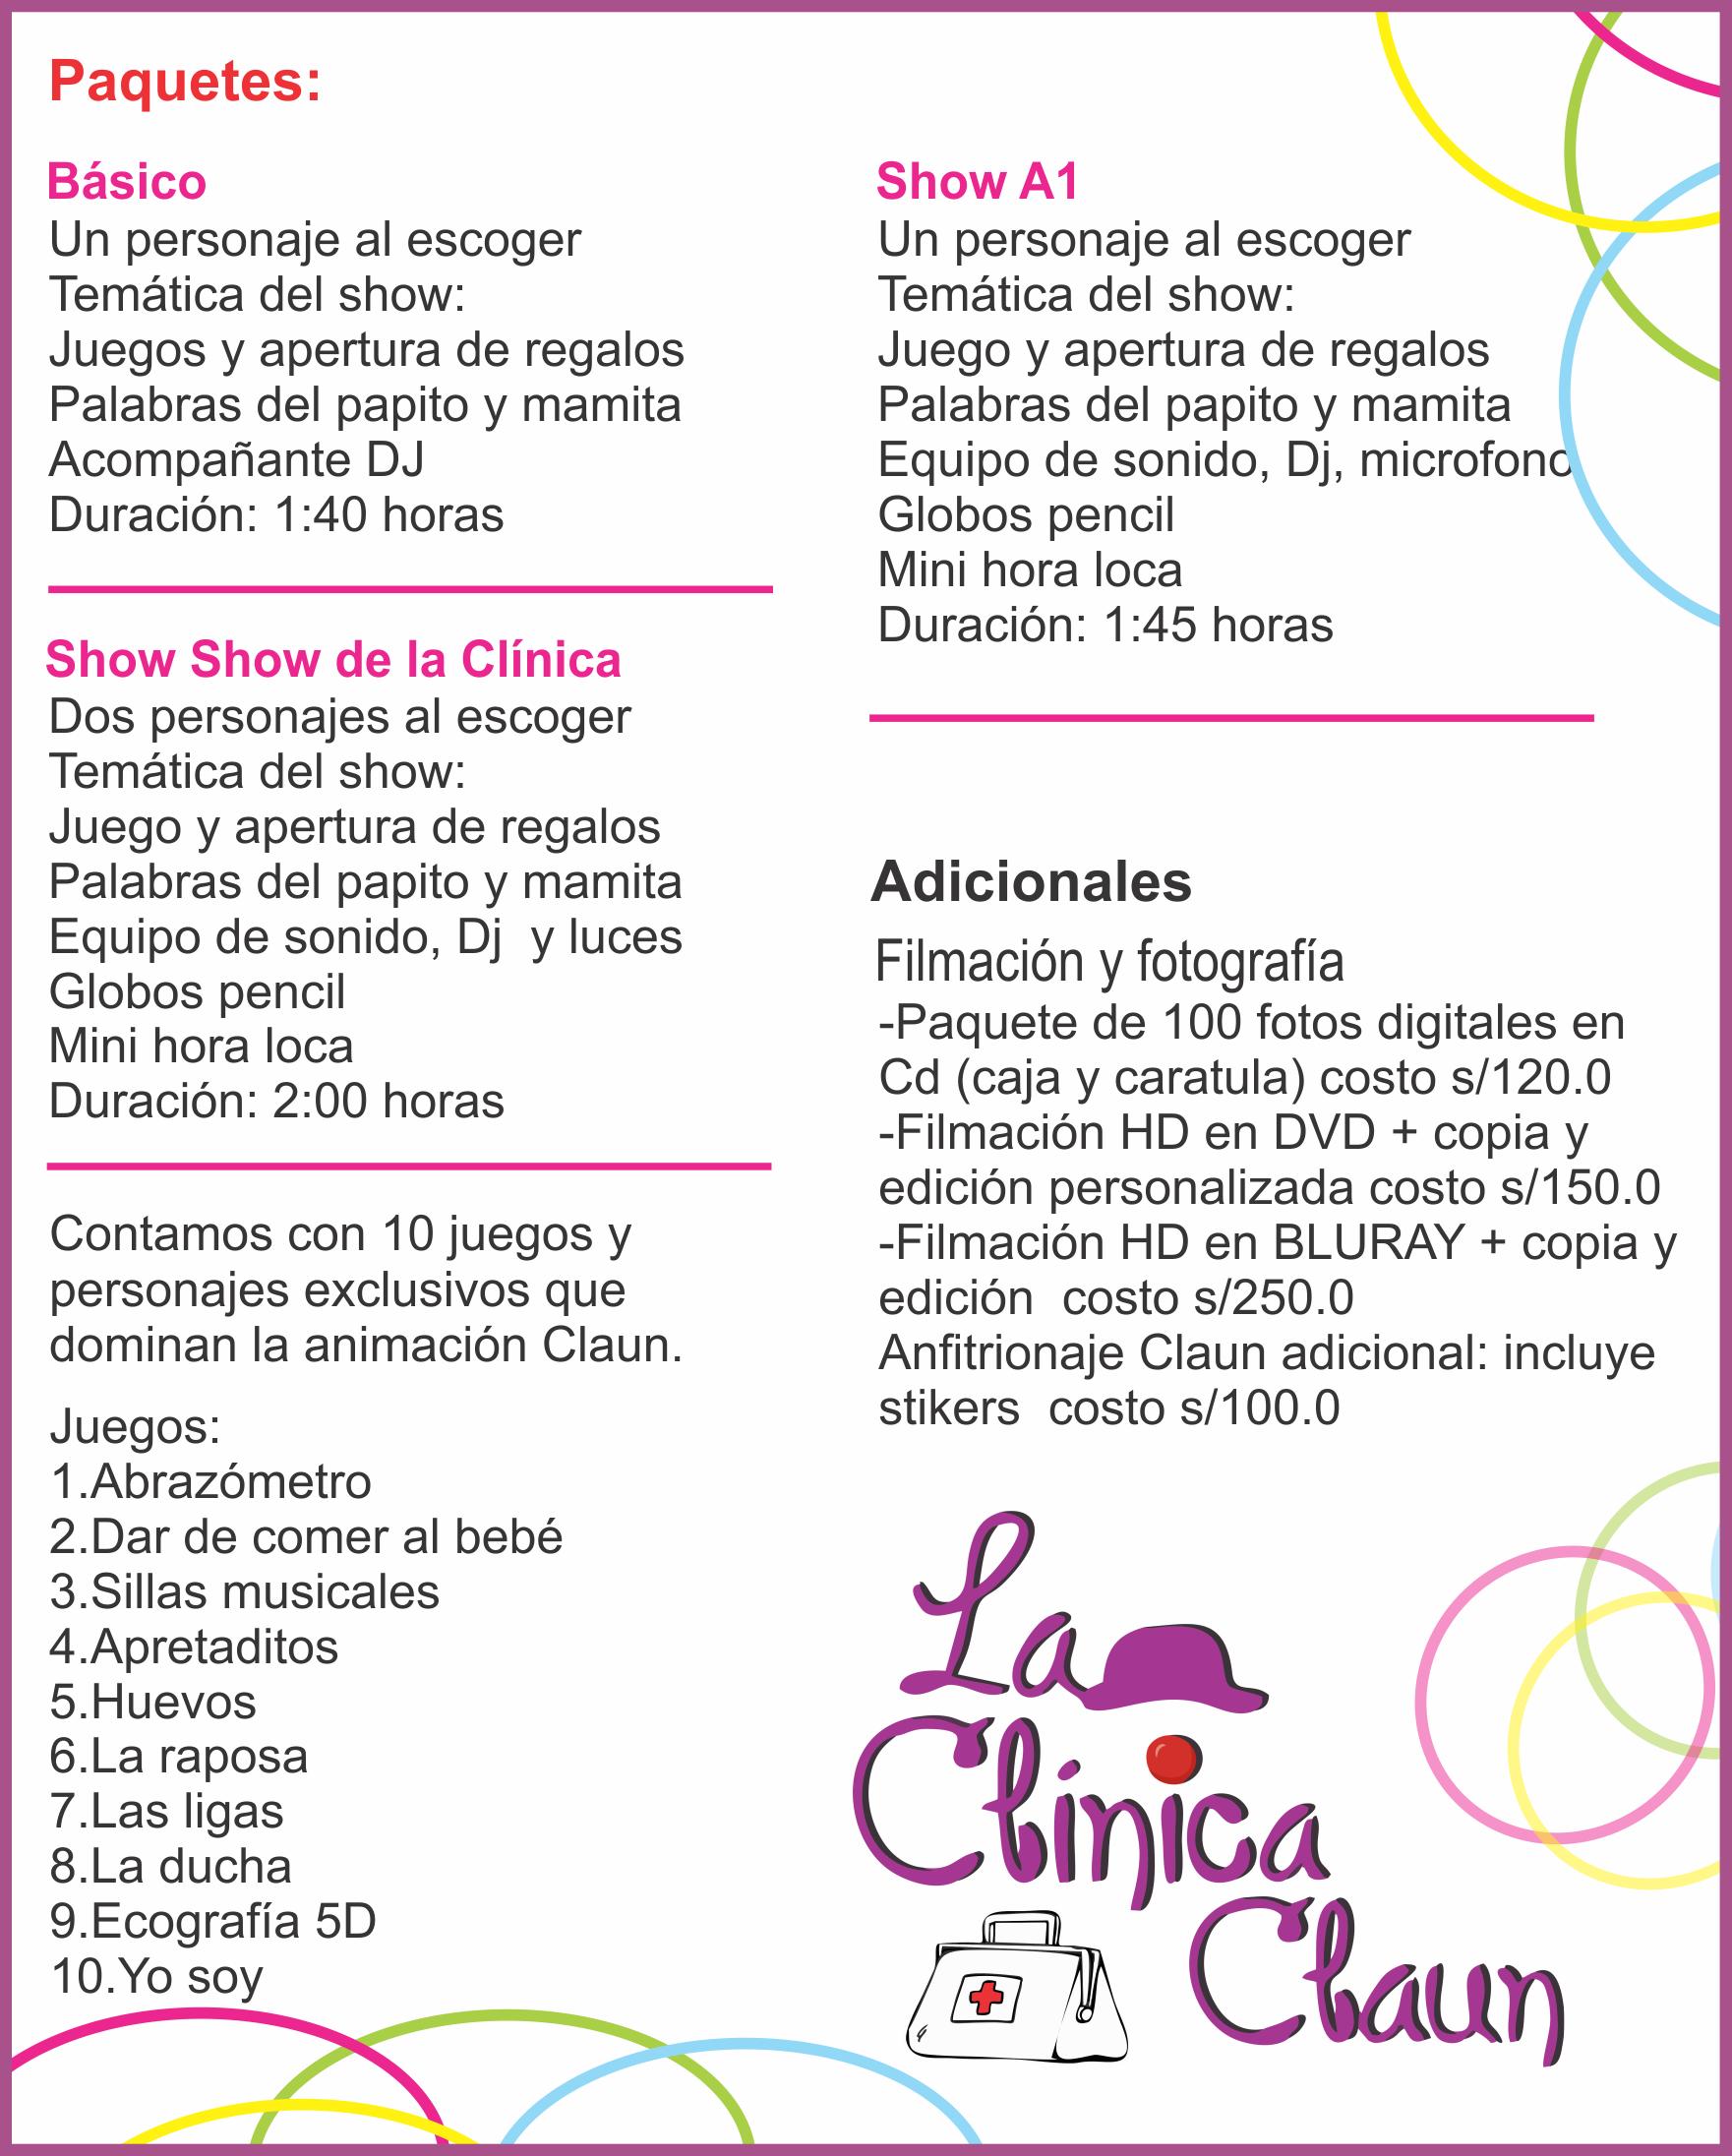 La clinica claun lima jr cutervo 1818 959884 for Lista de empresas en lima